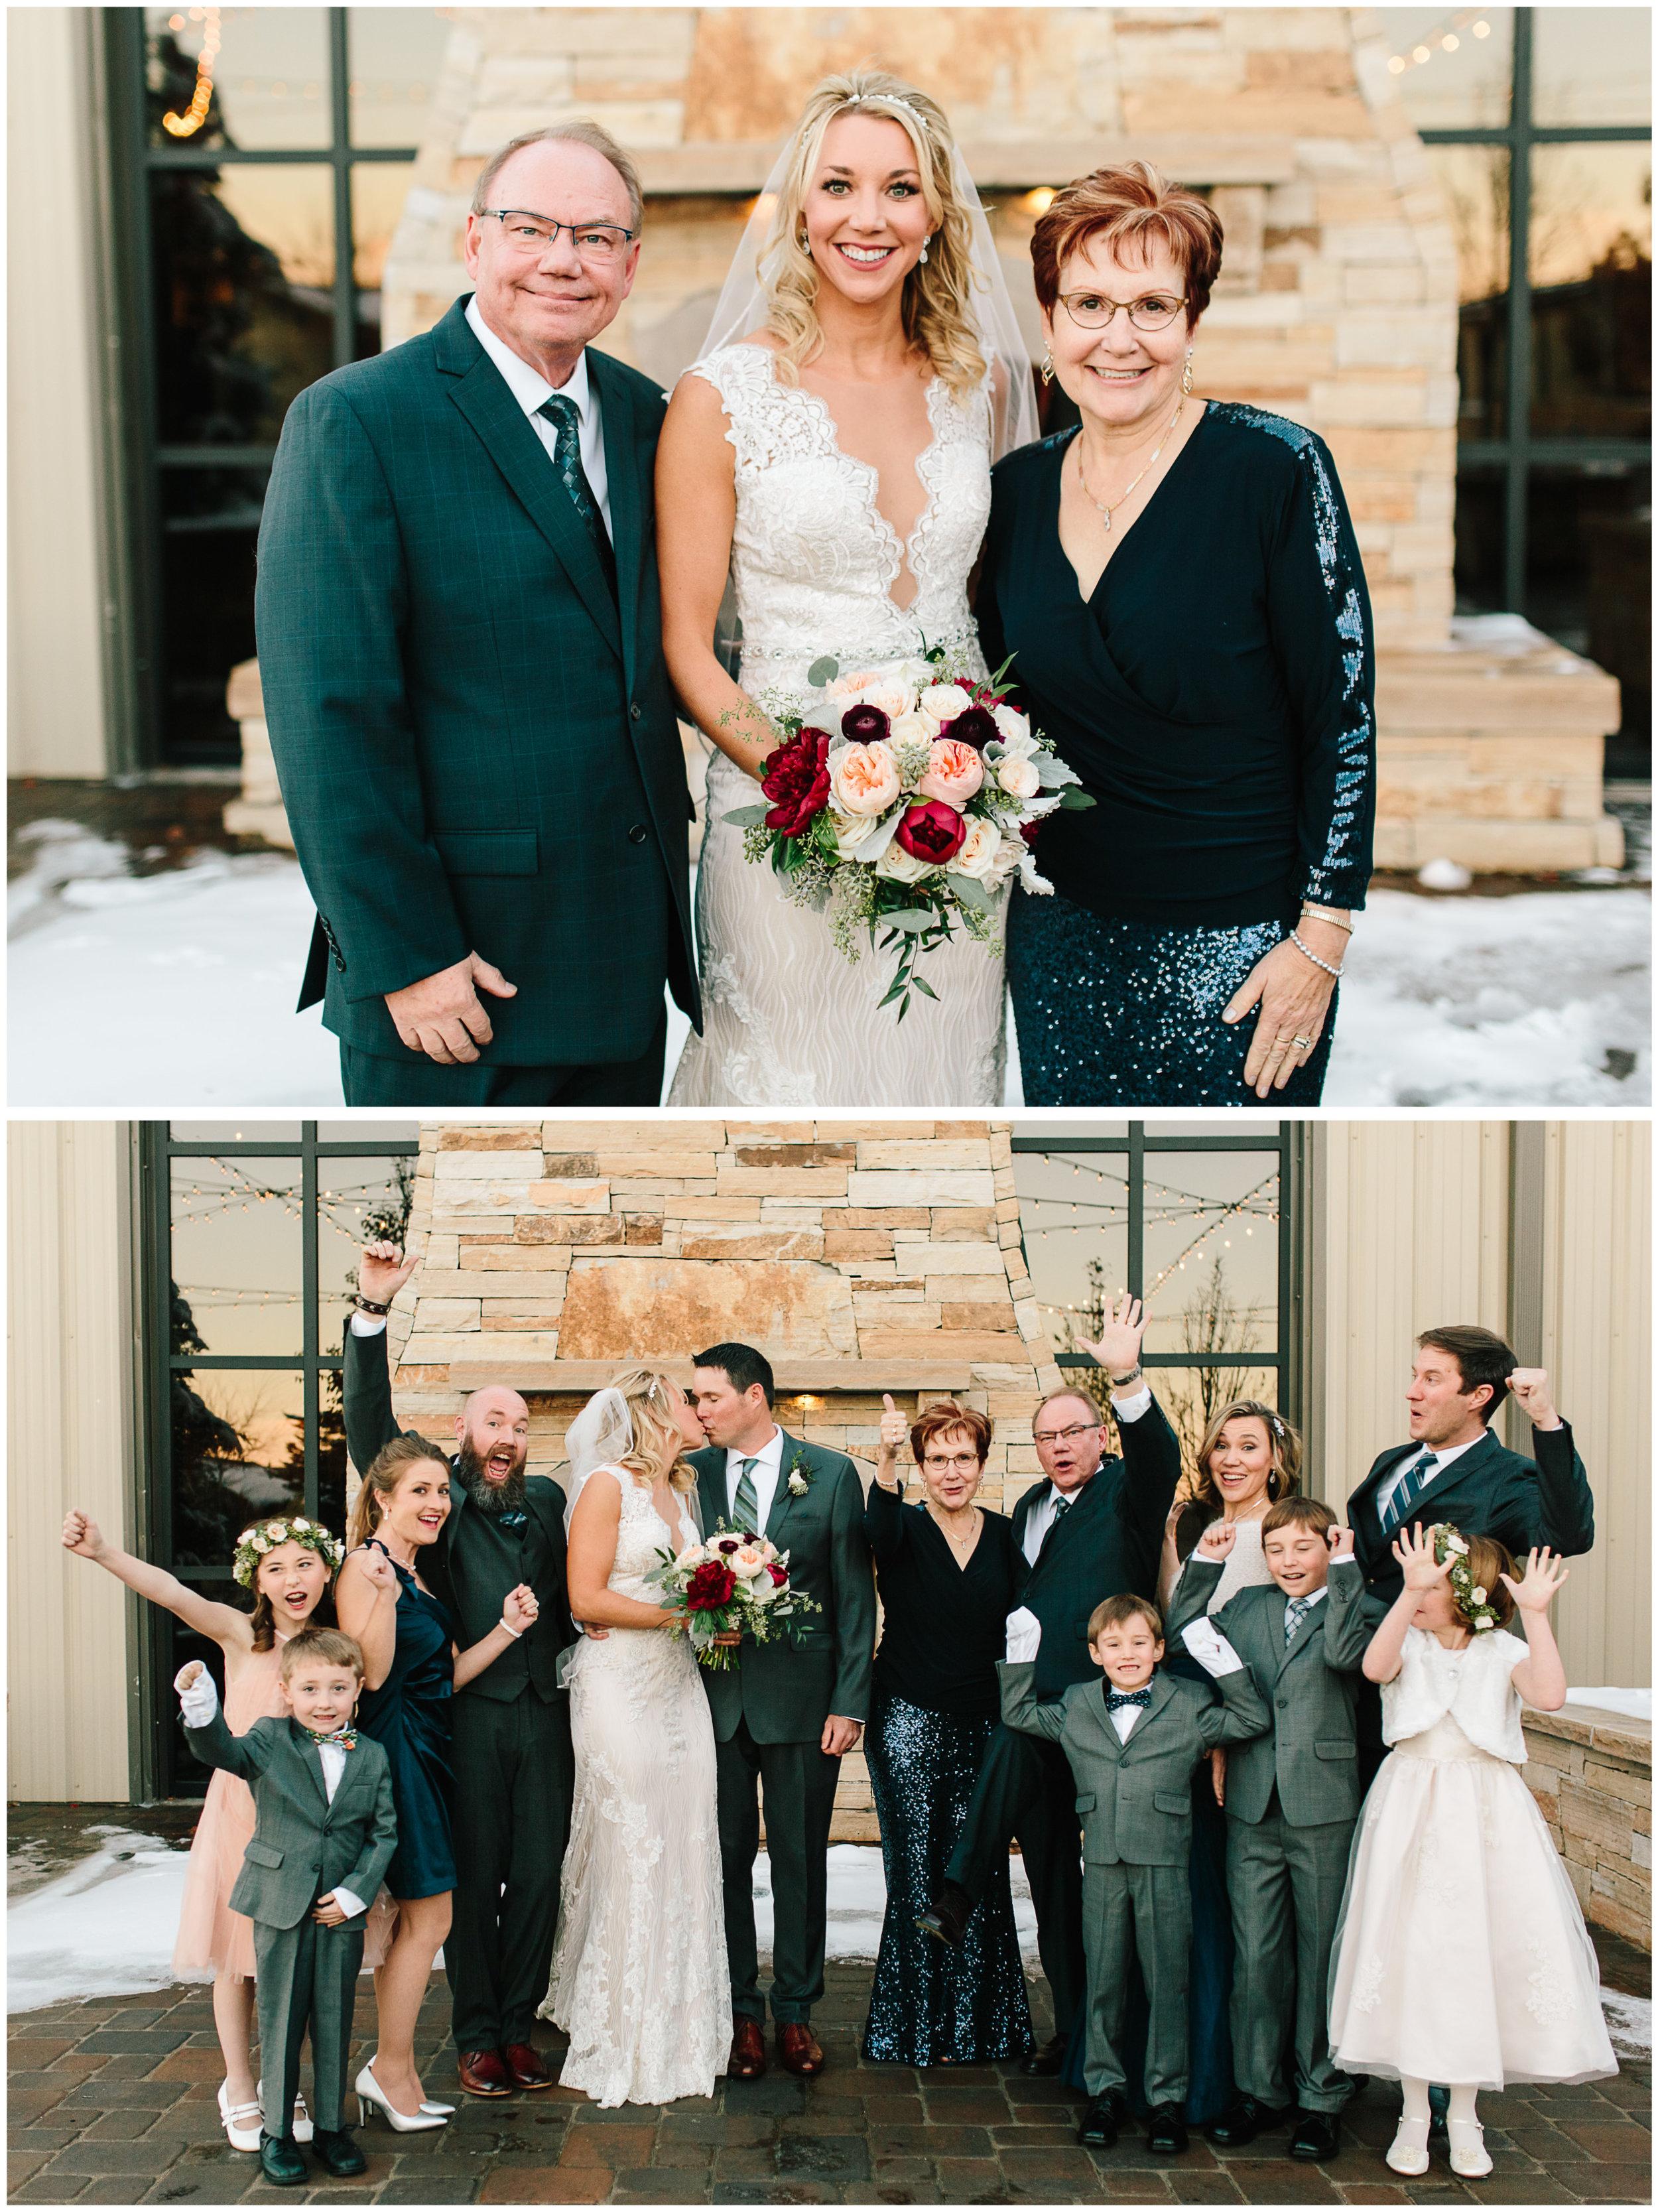 spruce_mountain_ranch_wedding_37.jpg